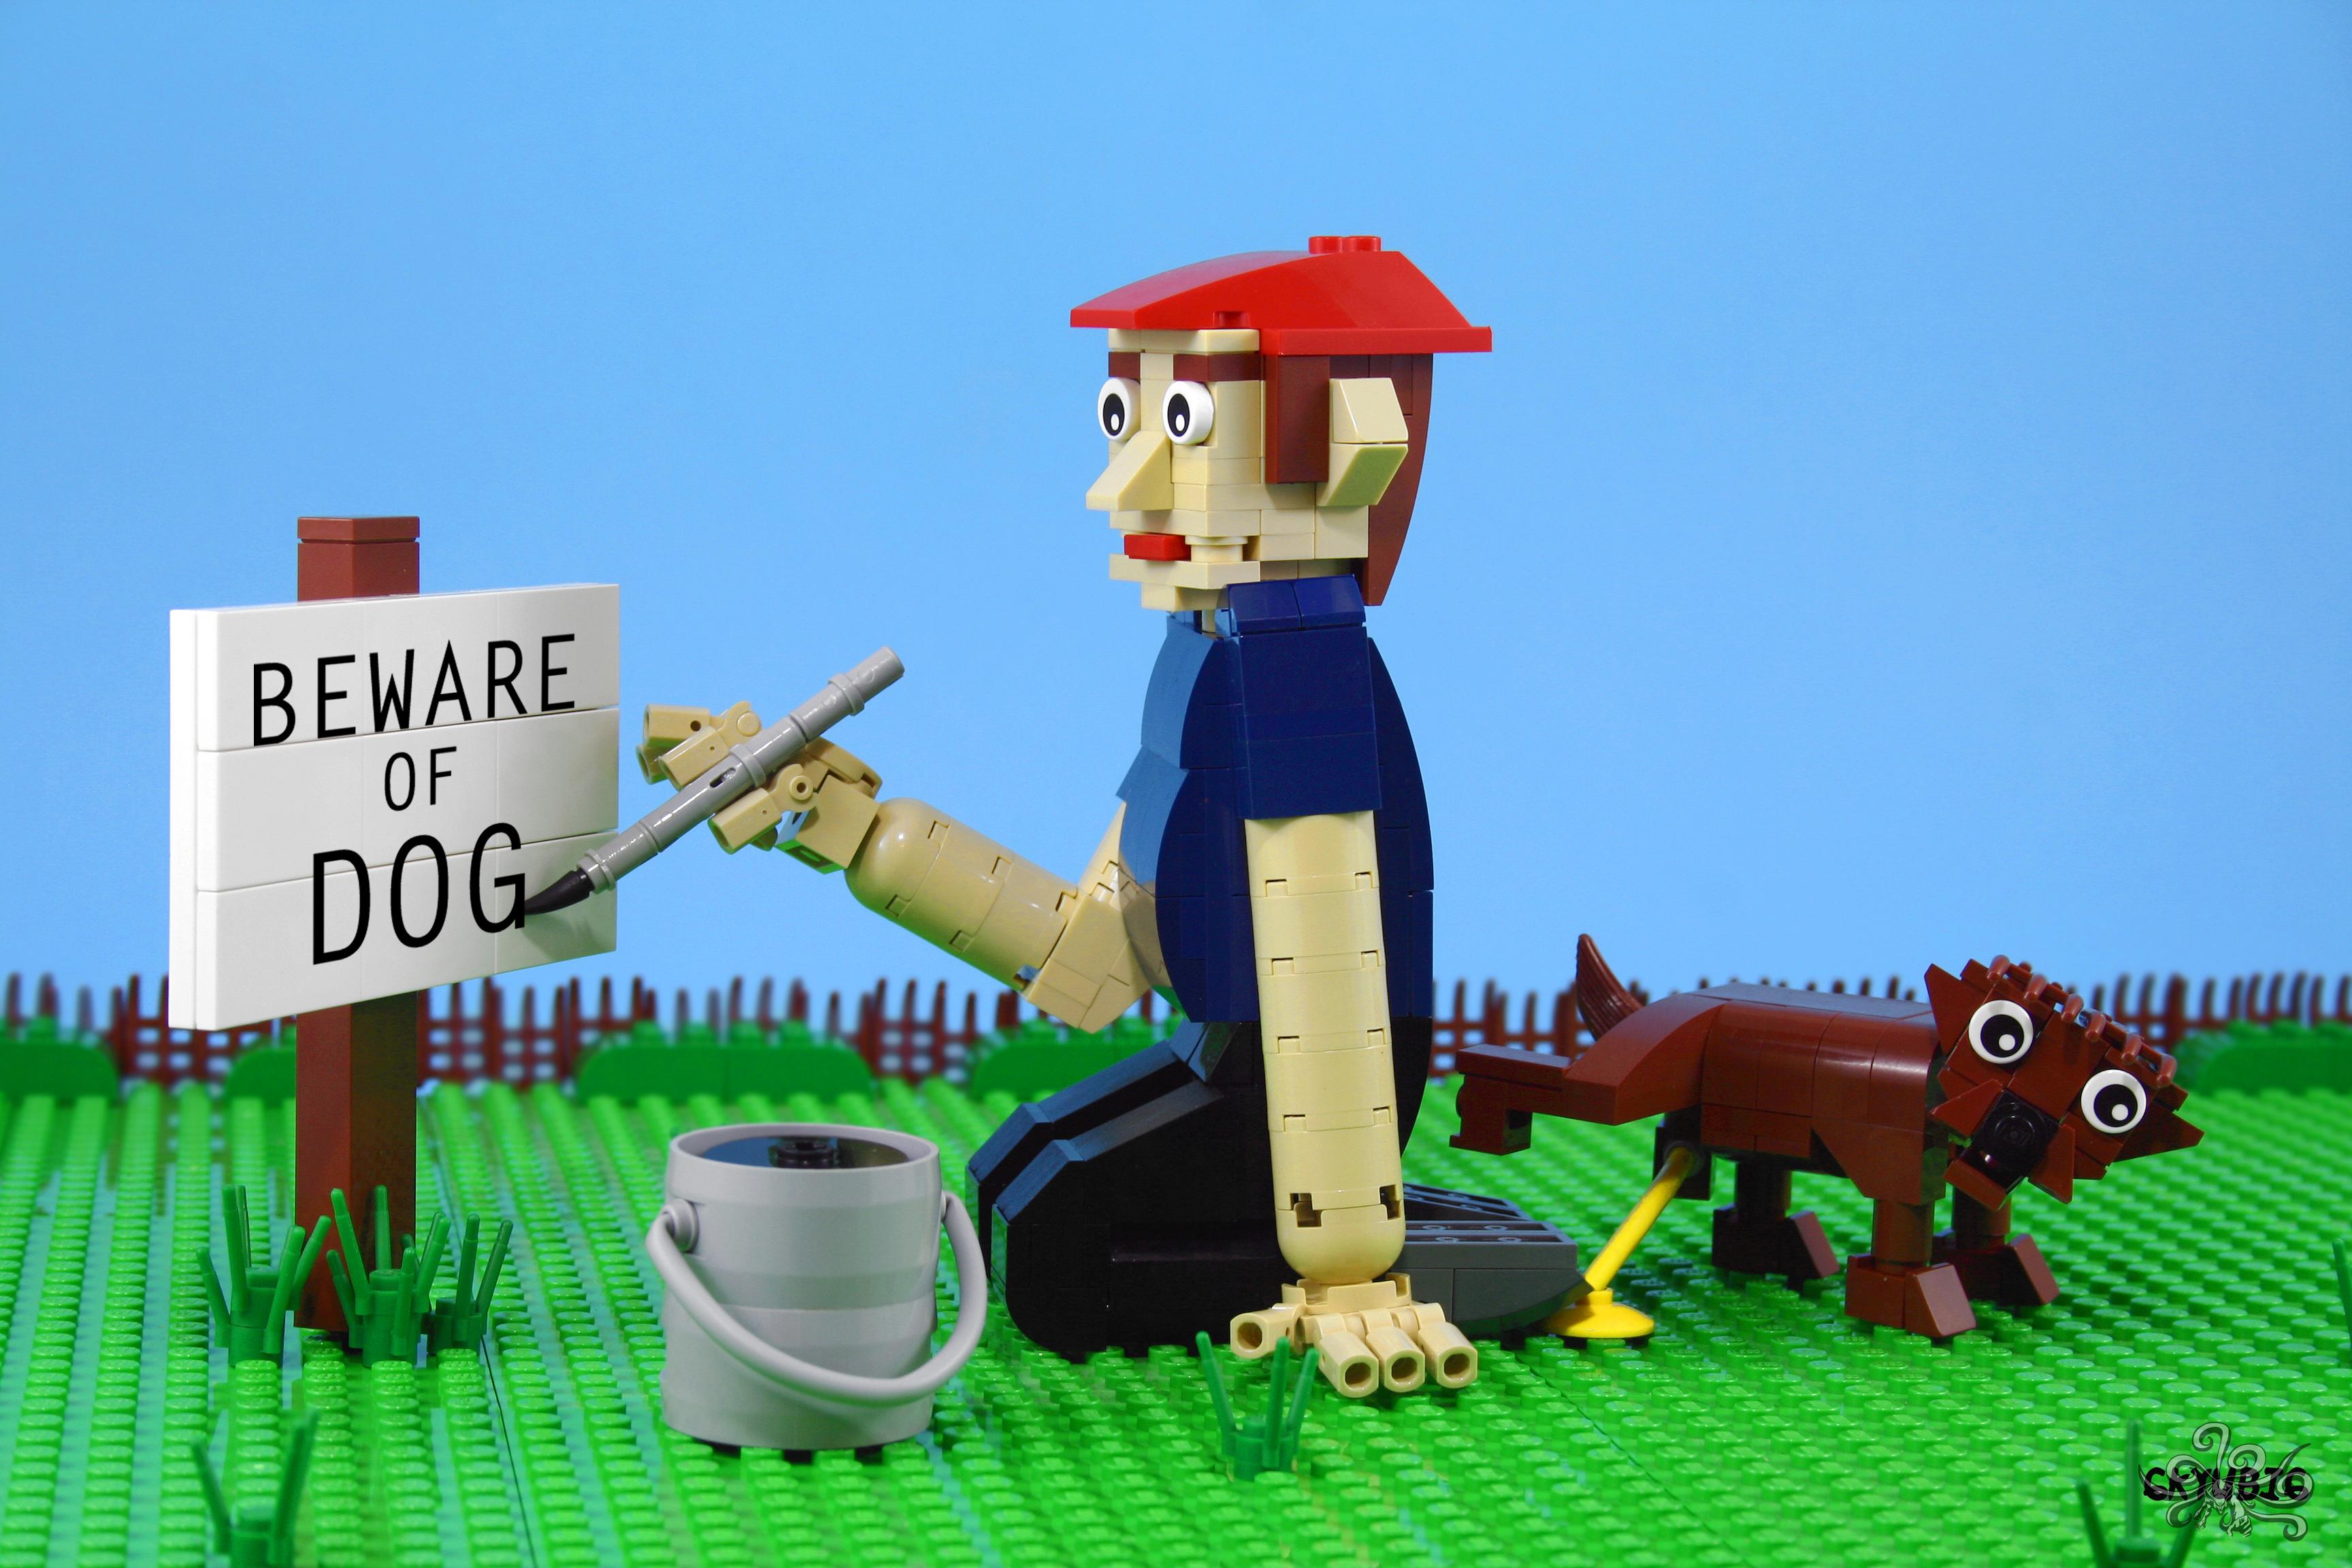 Wallpaper Rumput Gambar Kartun Lego Anjing Mainan Lucu Moc 6kyubi6 Ironbuilder